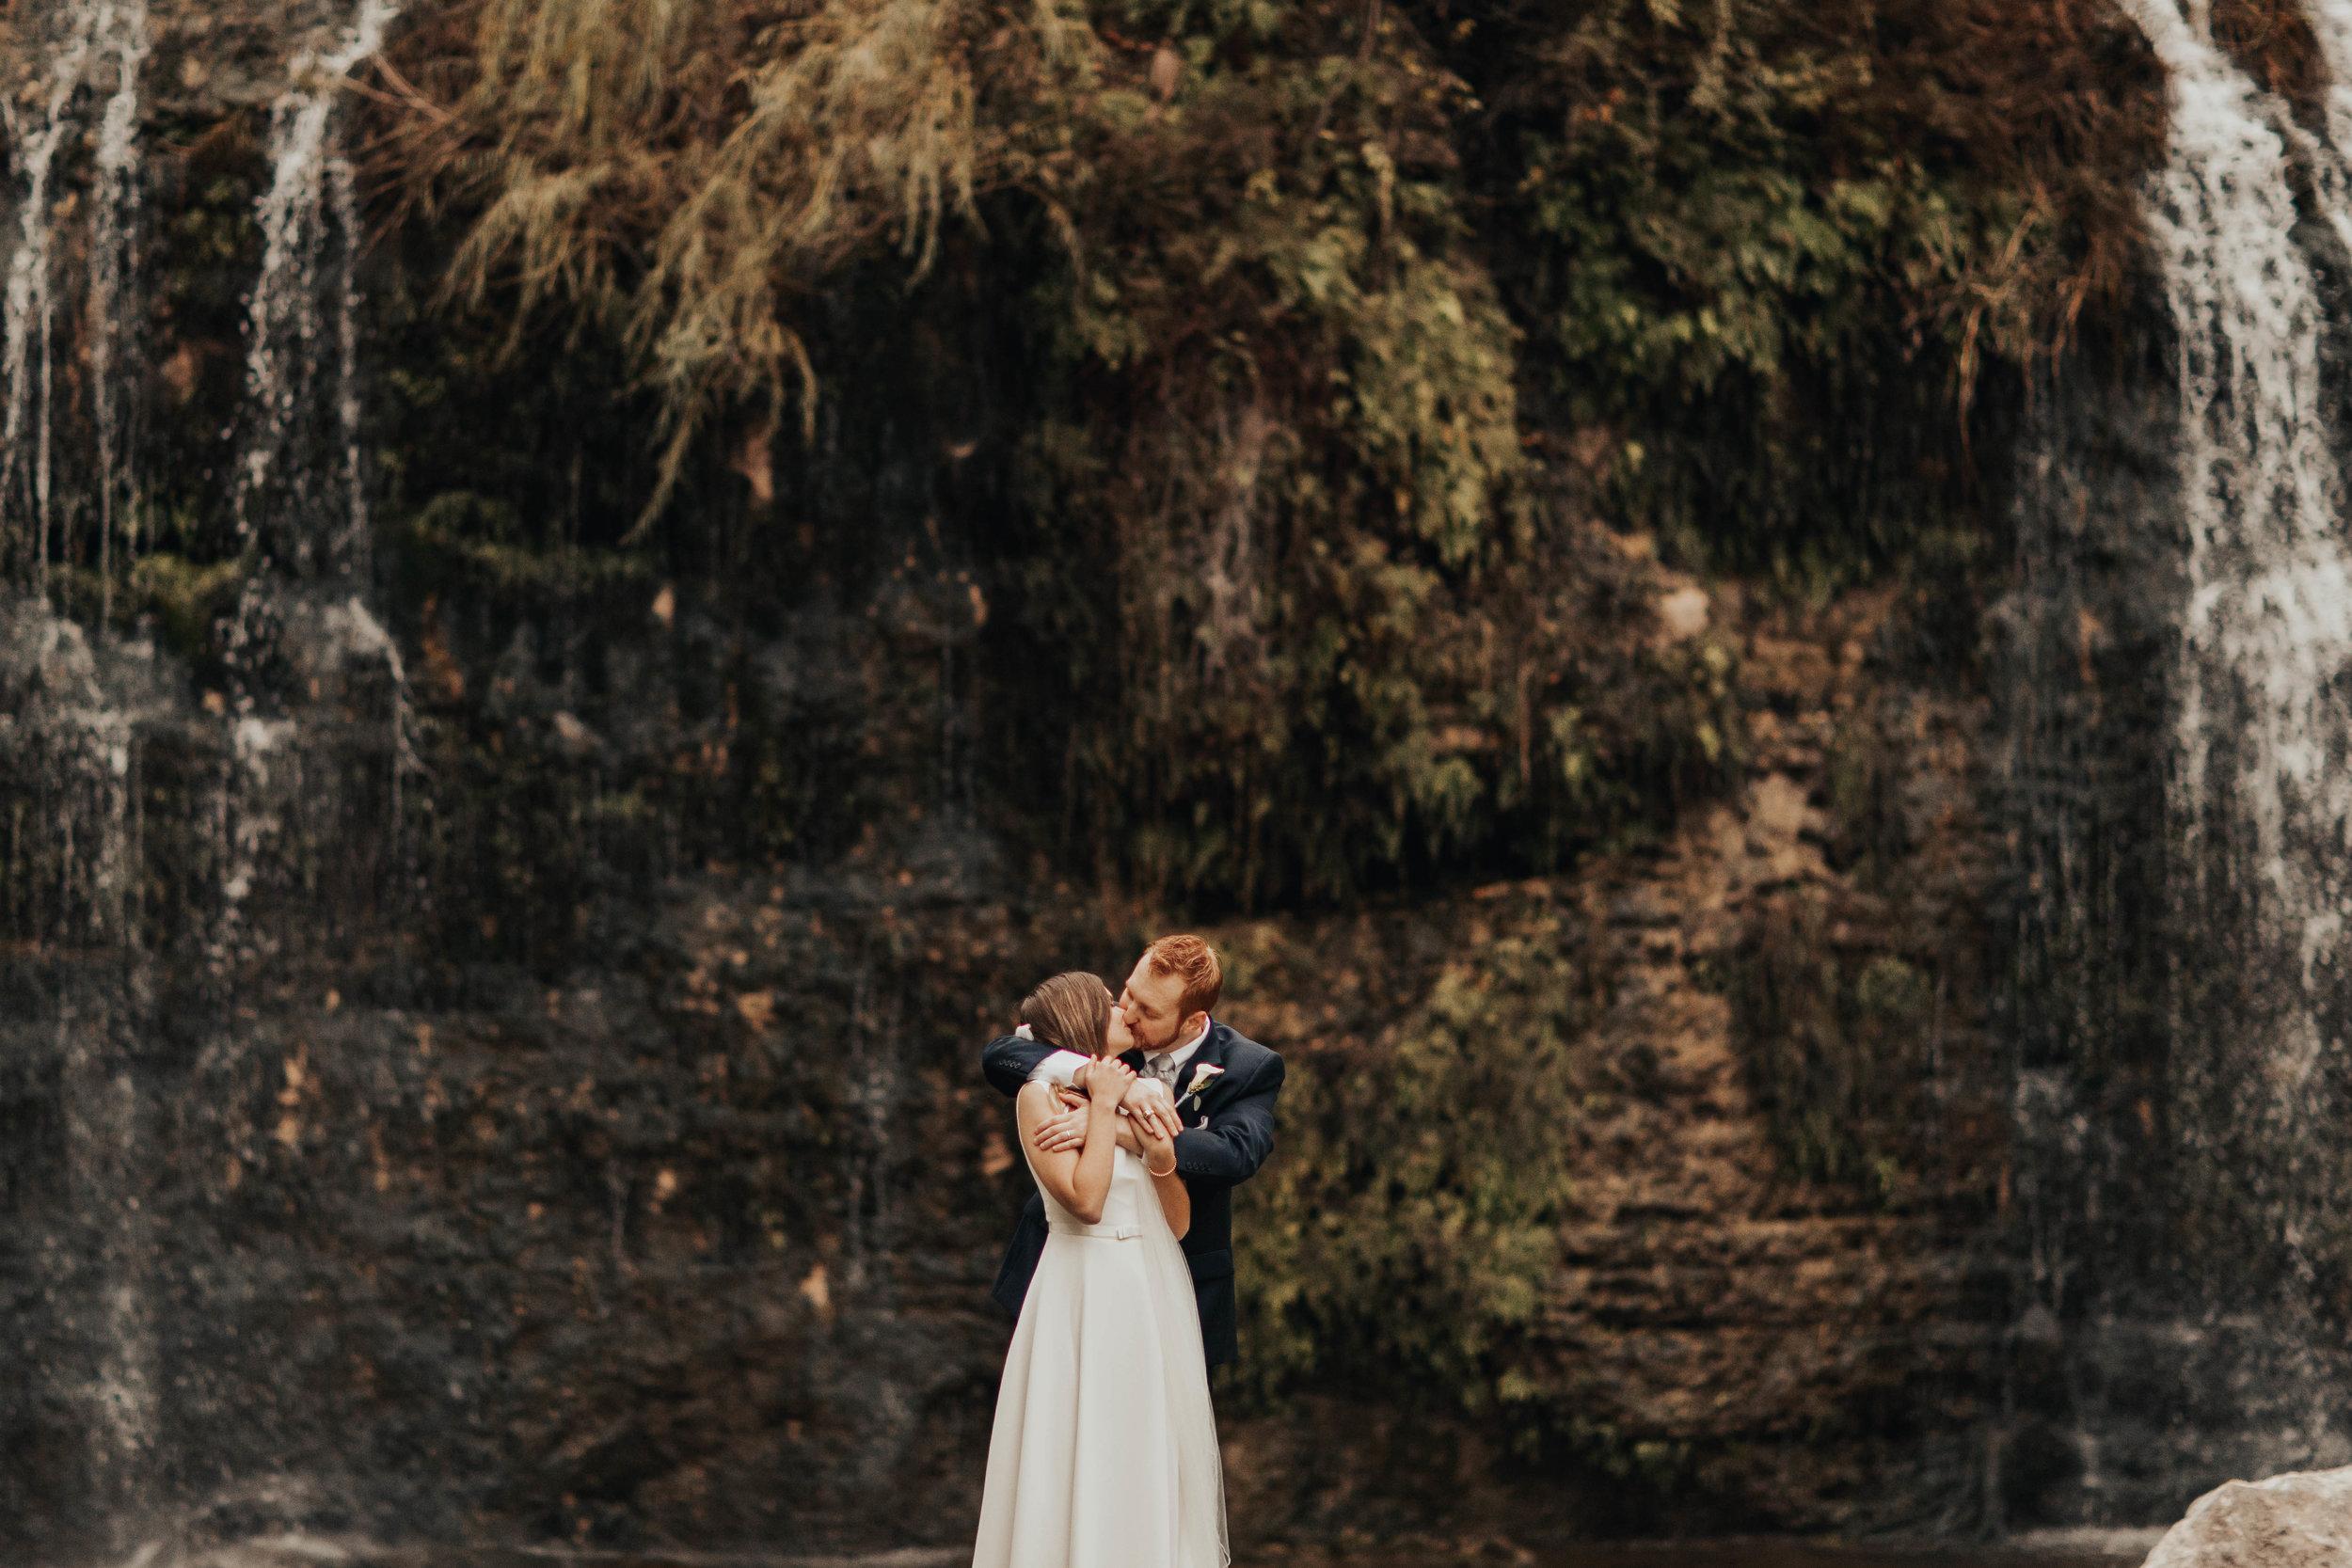 Brad_and_Karoline_Wedding-255.jpg